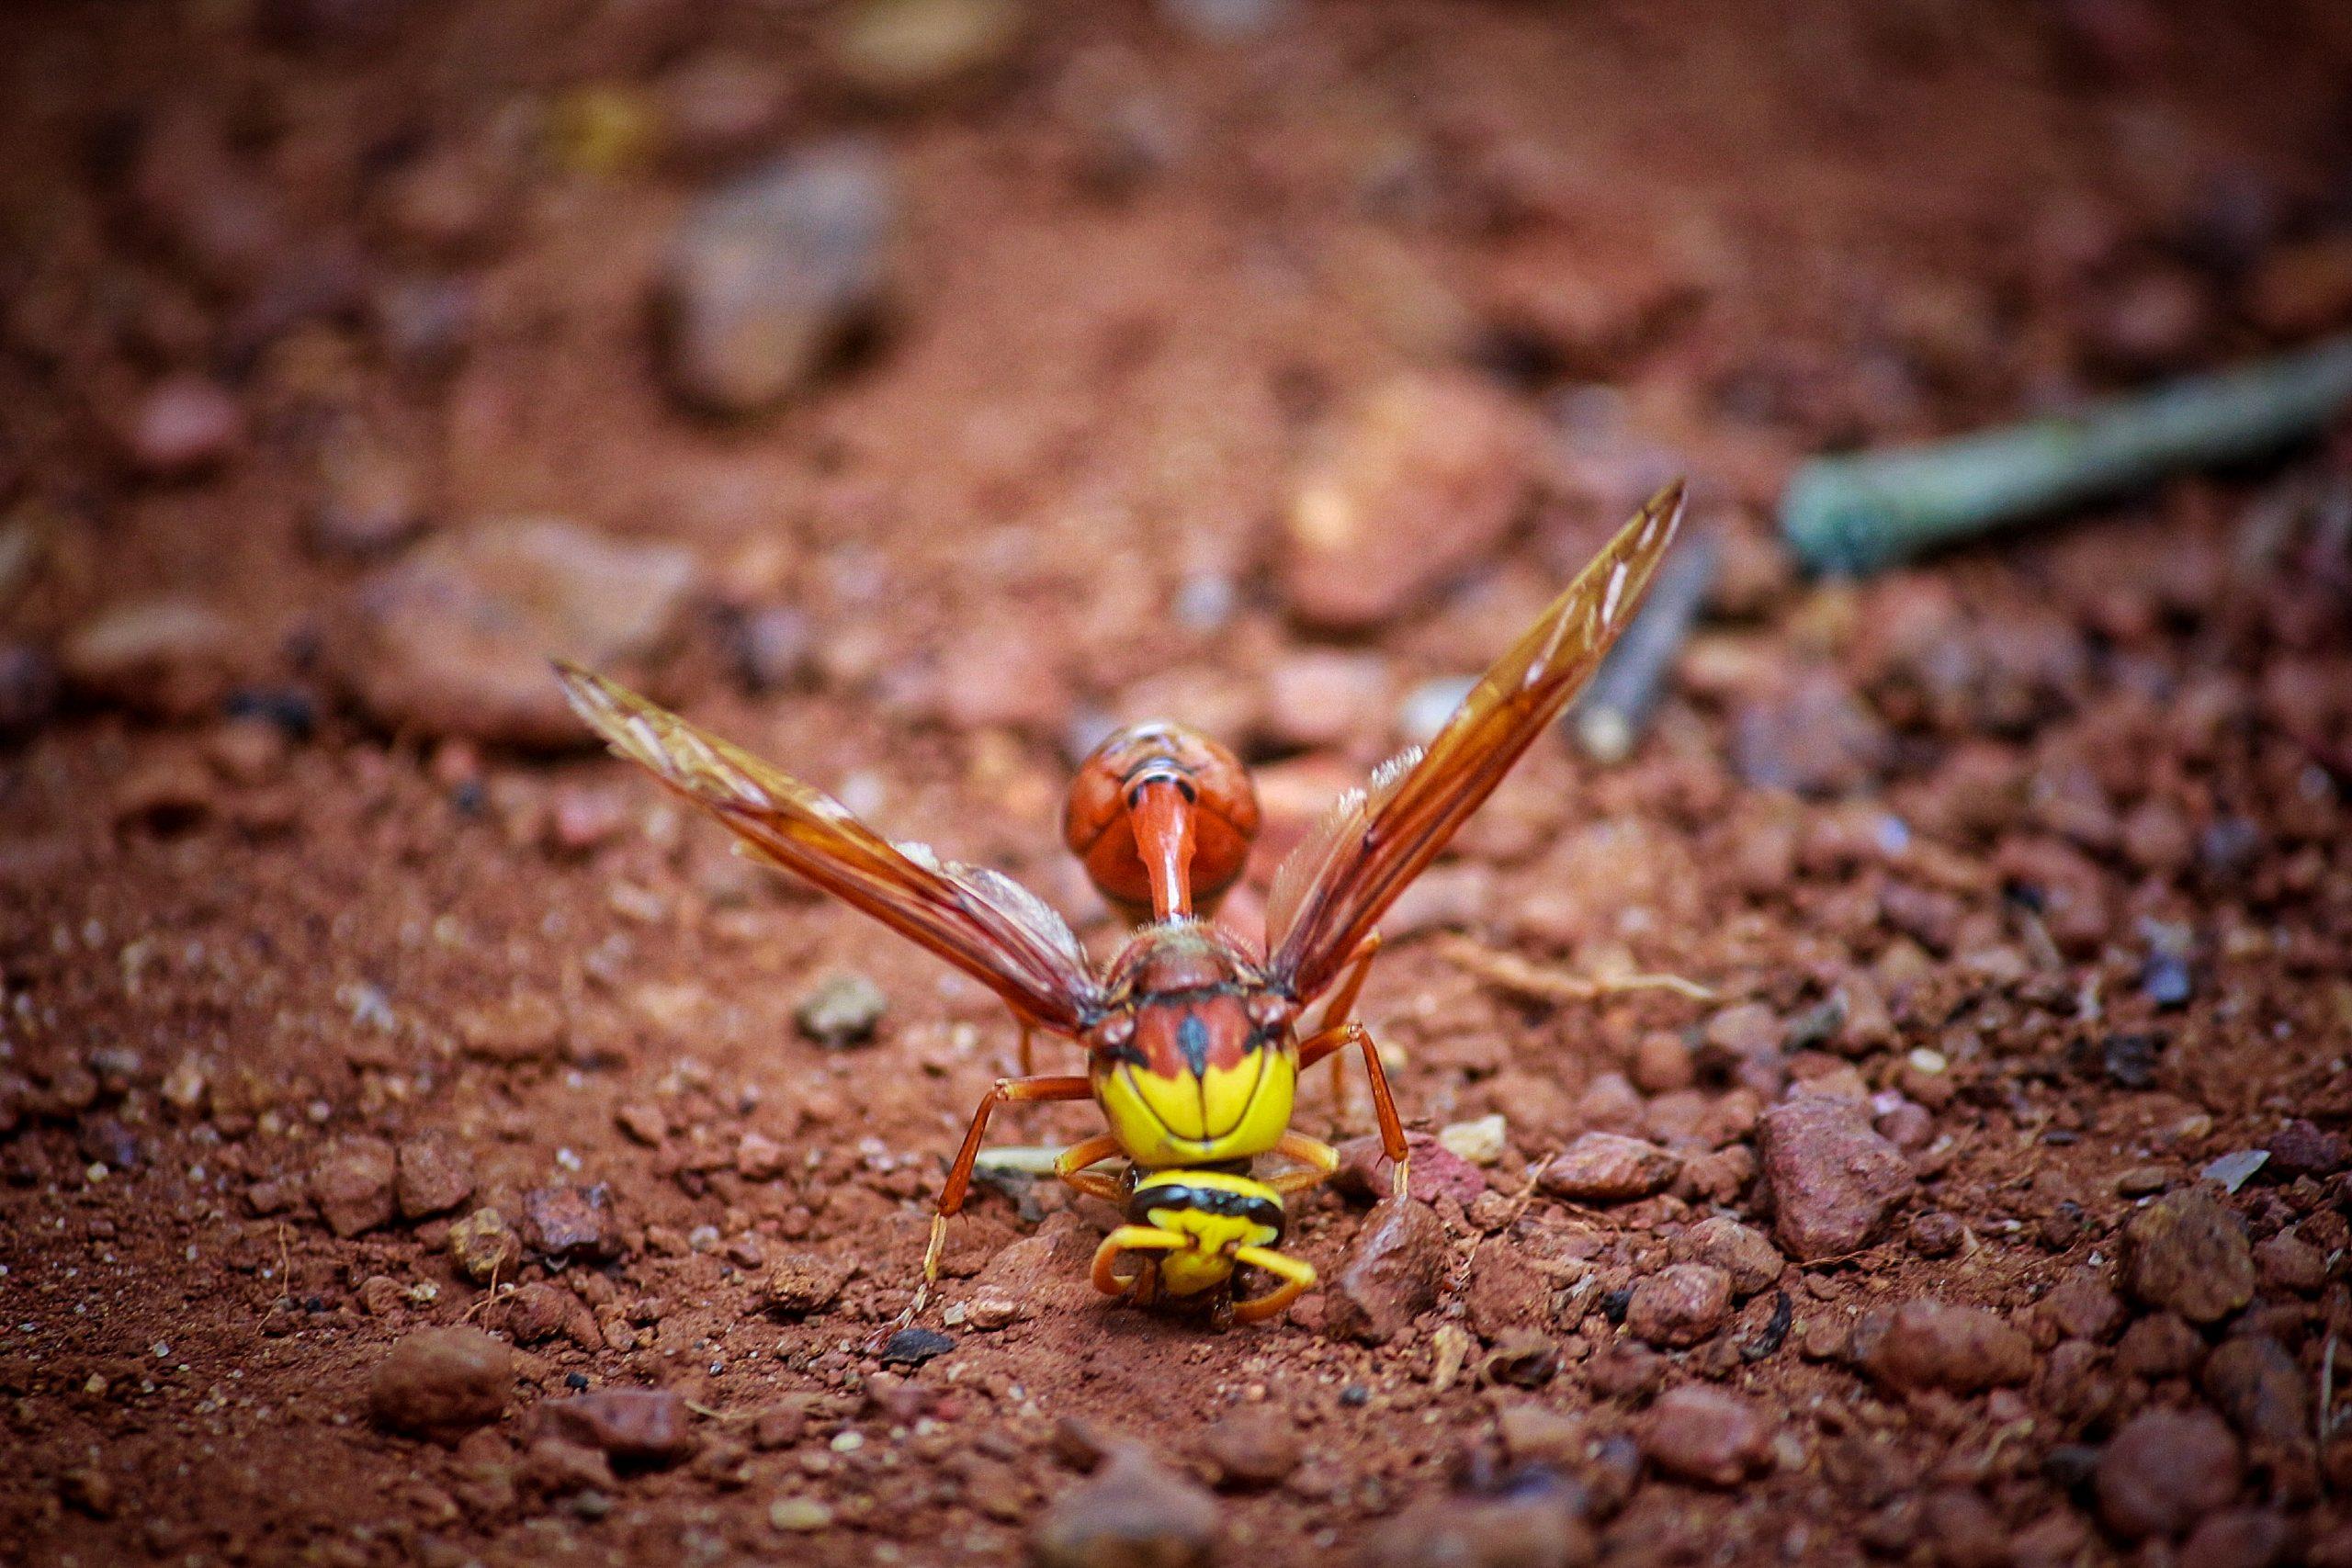 Hornet bee on ground